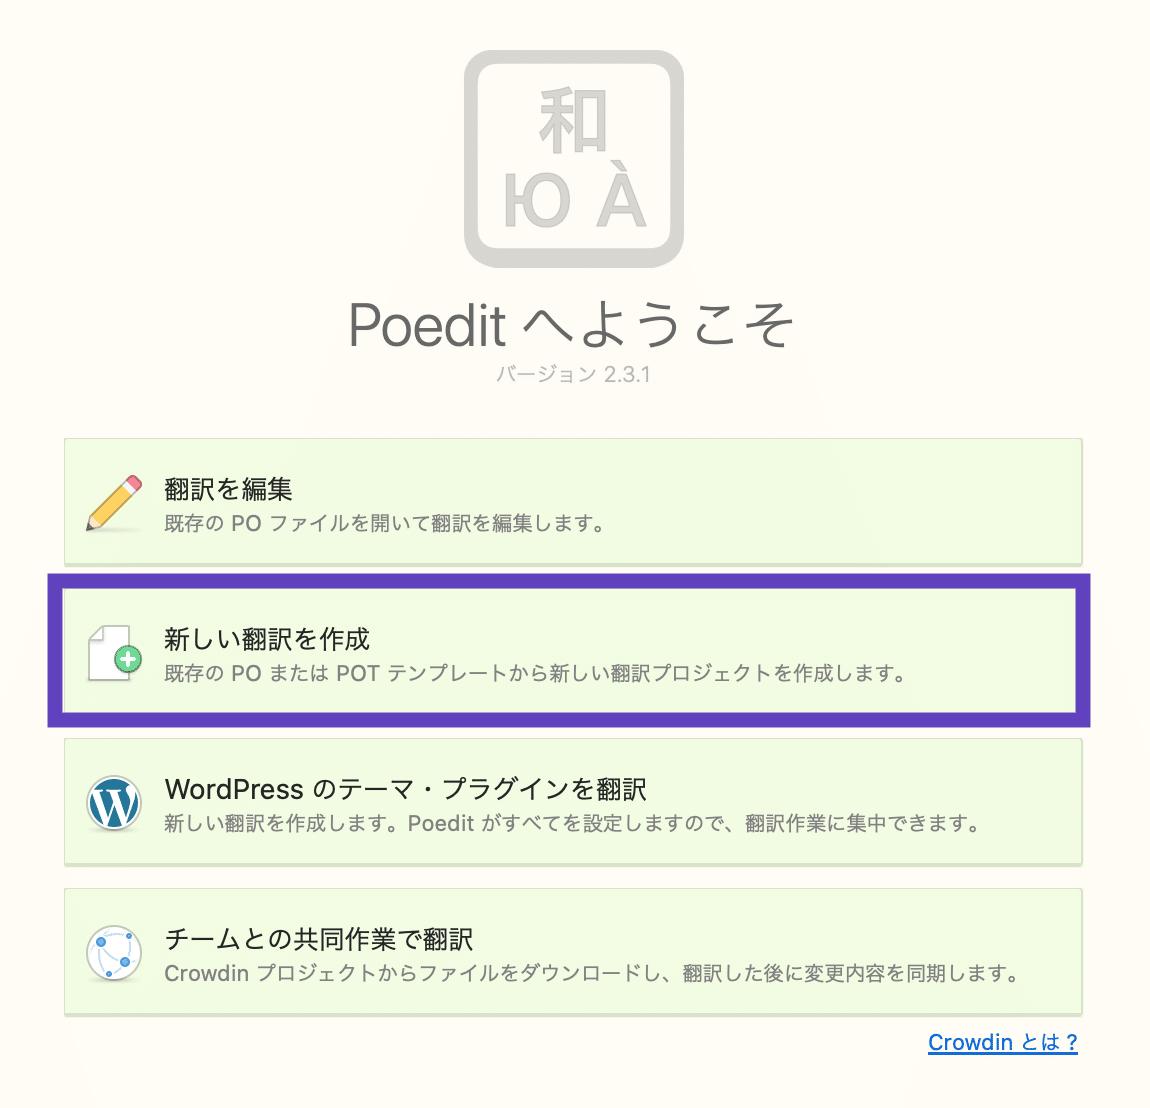 Poeditの新しい翻訳を作成